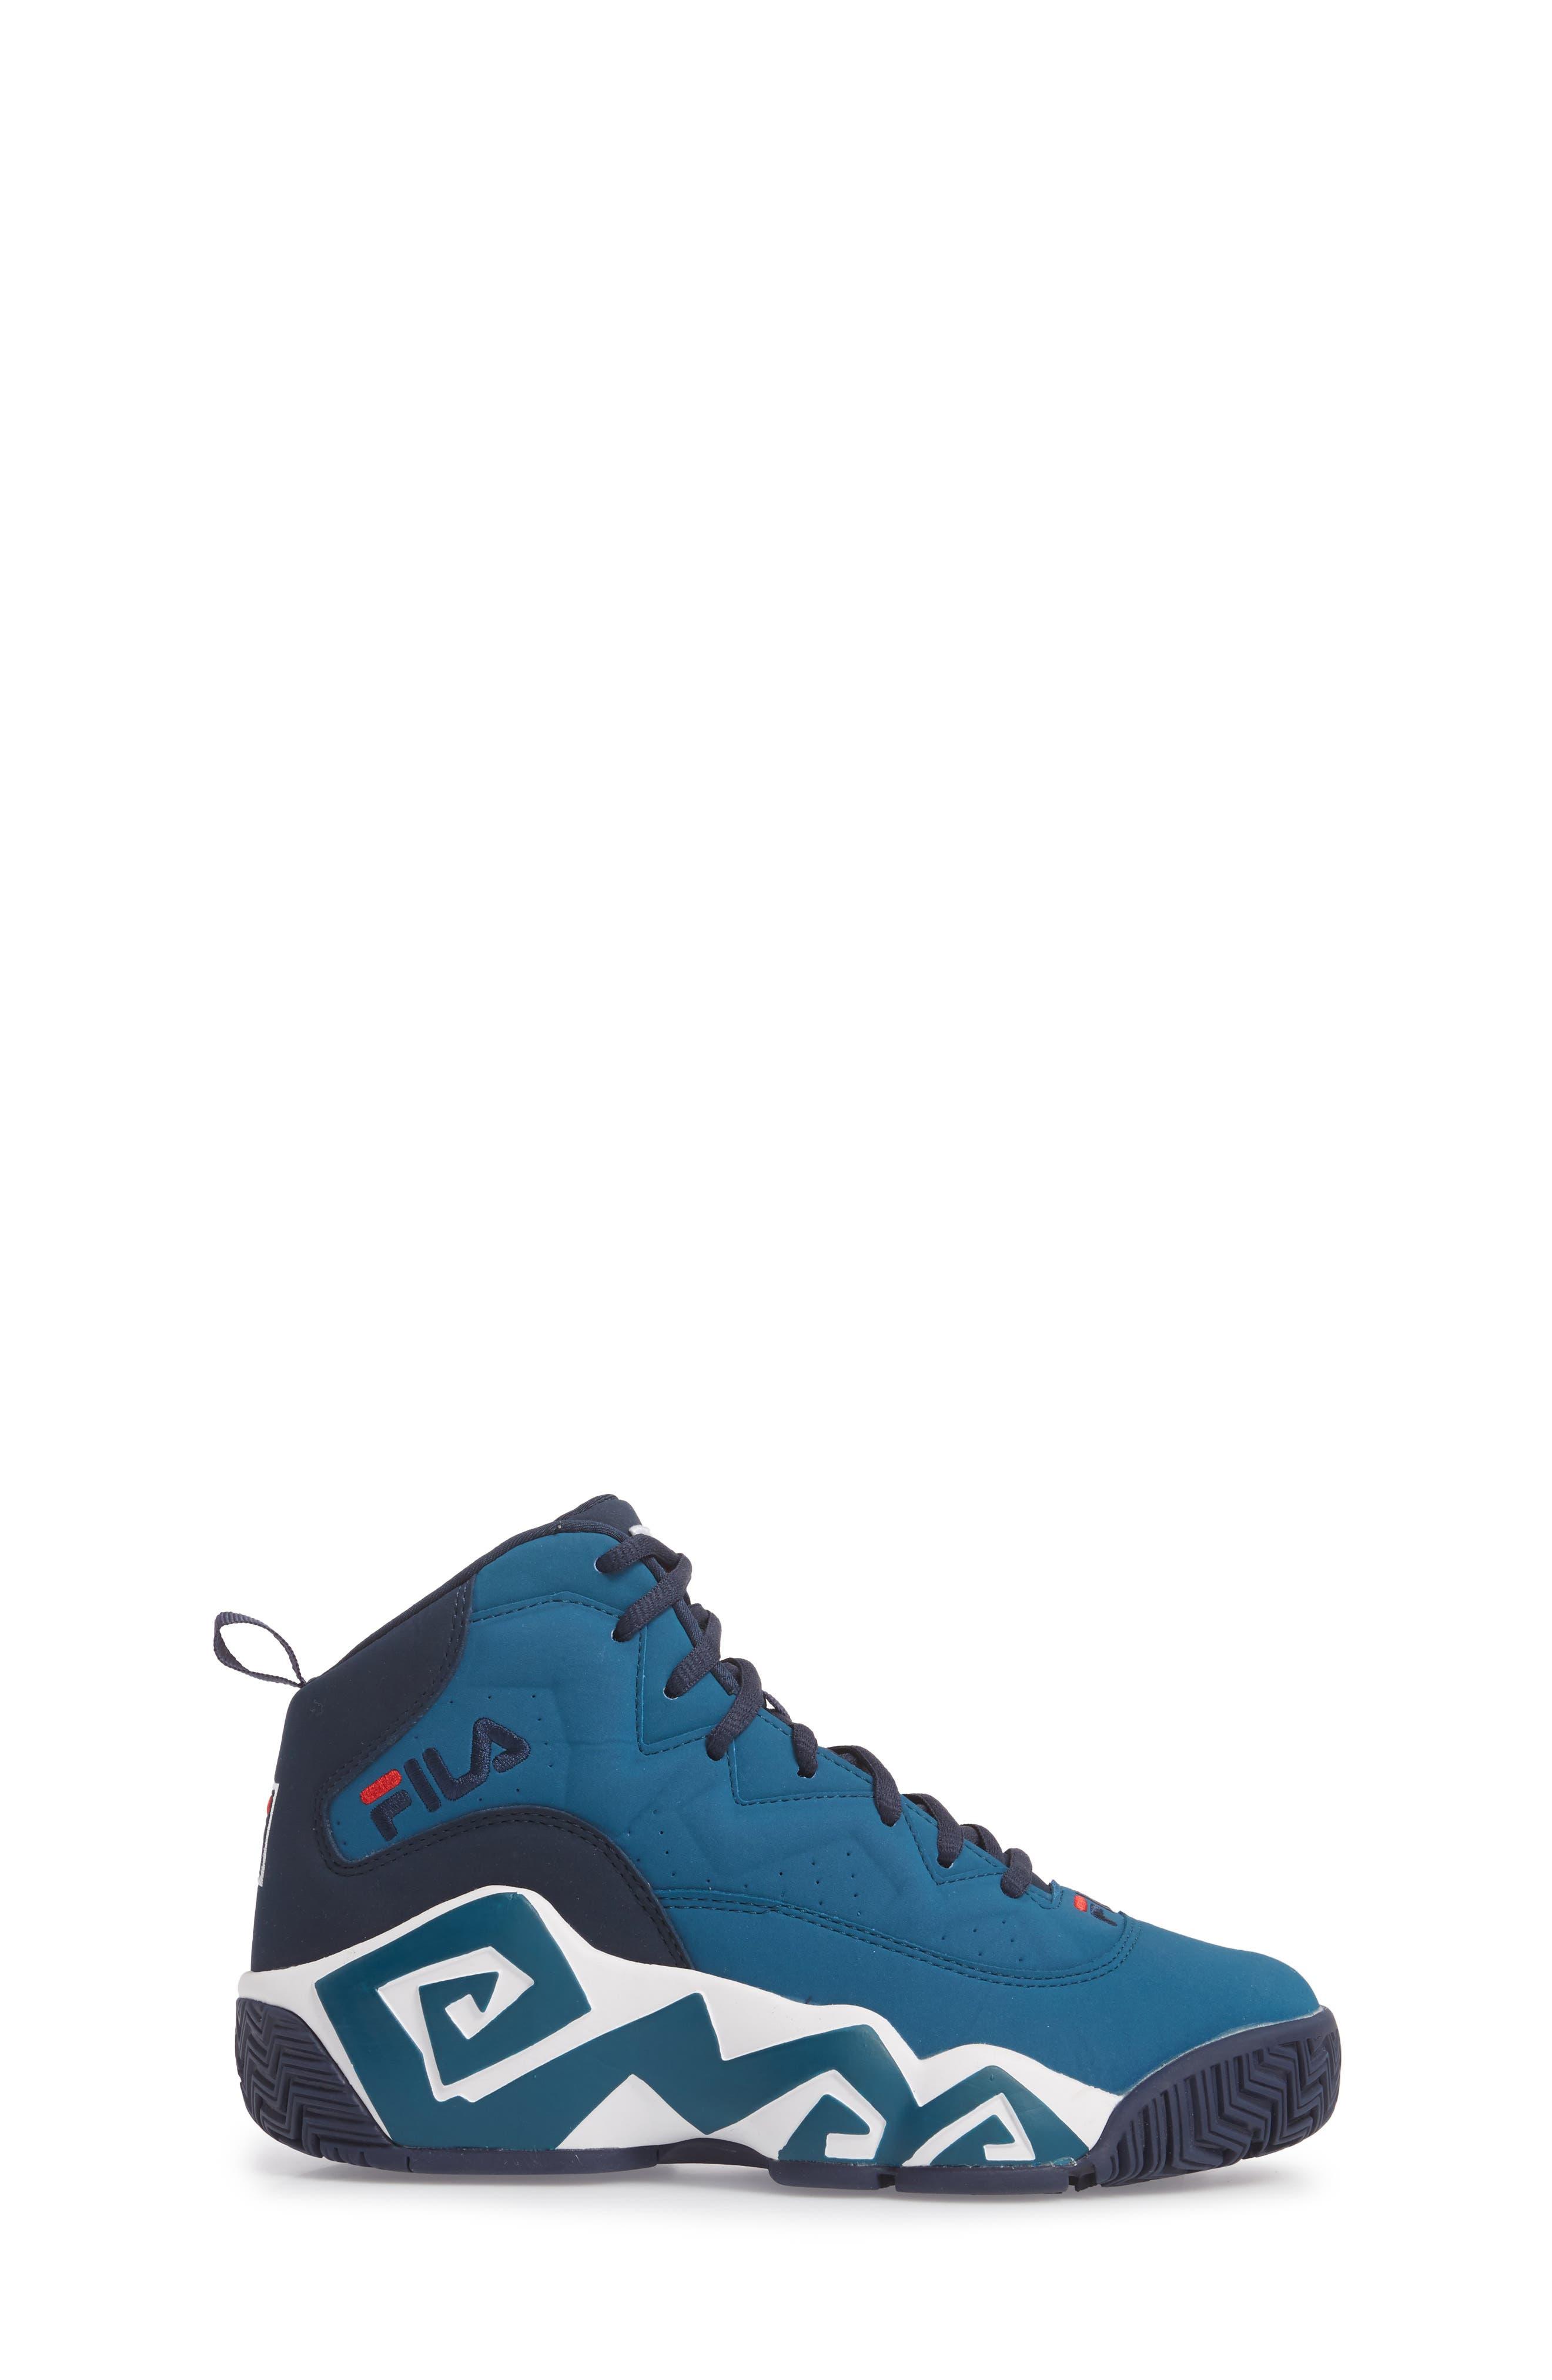 MB High Top Sneaker,                             Alternate thumbnail 3, color,                             INK BLUE/ FILA NAVY